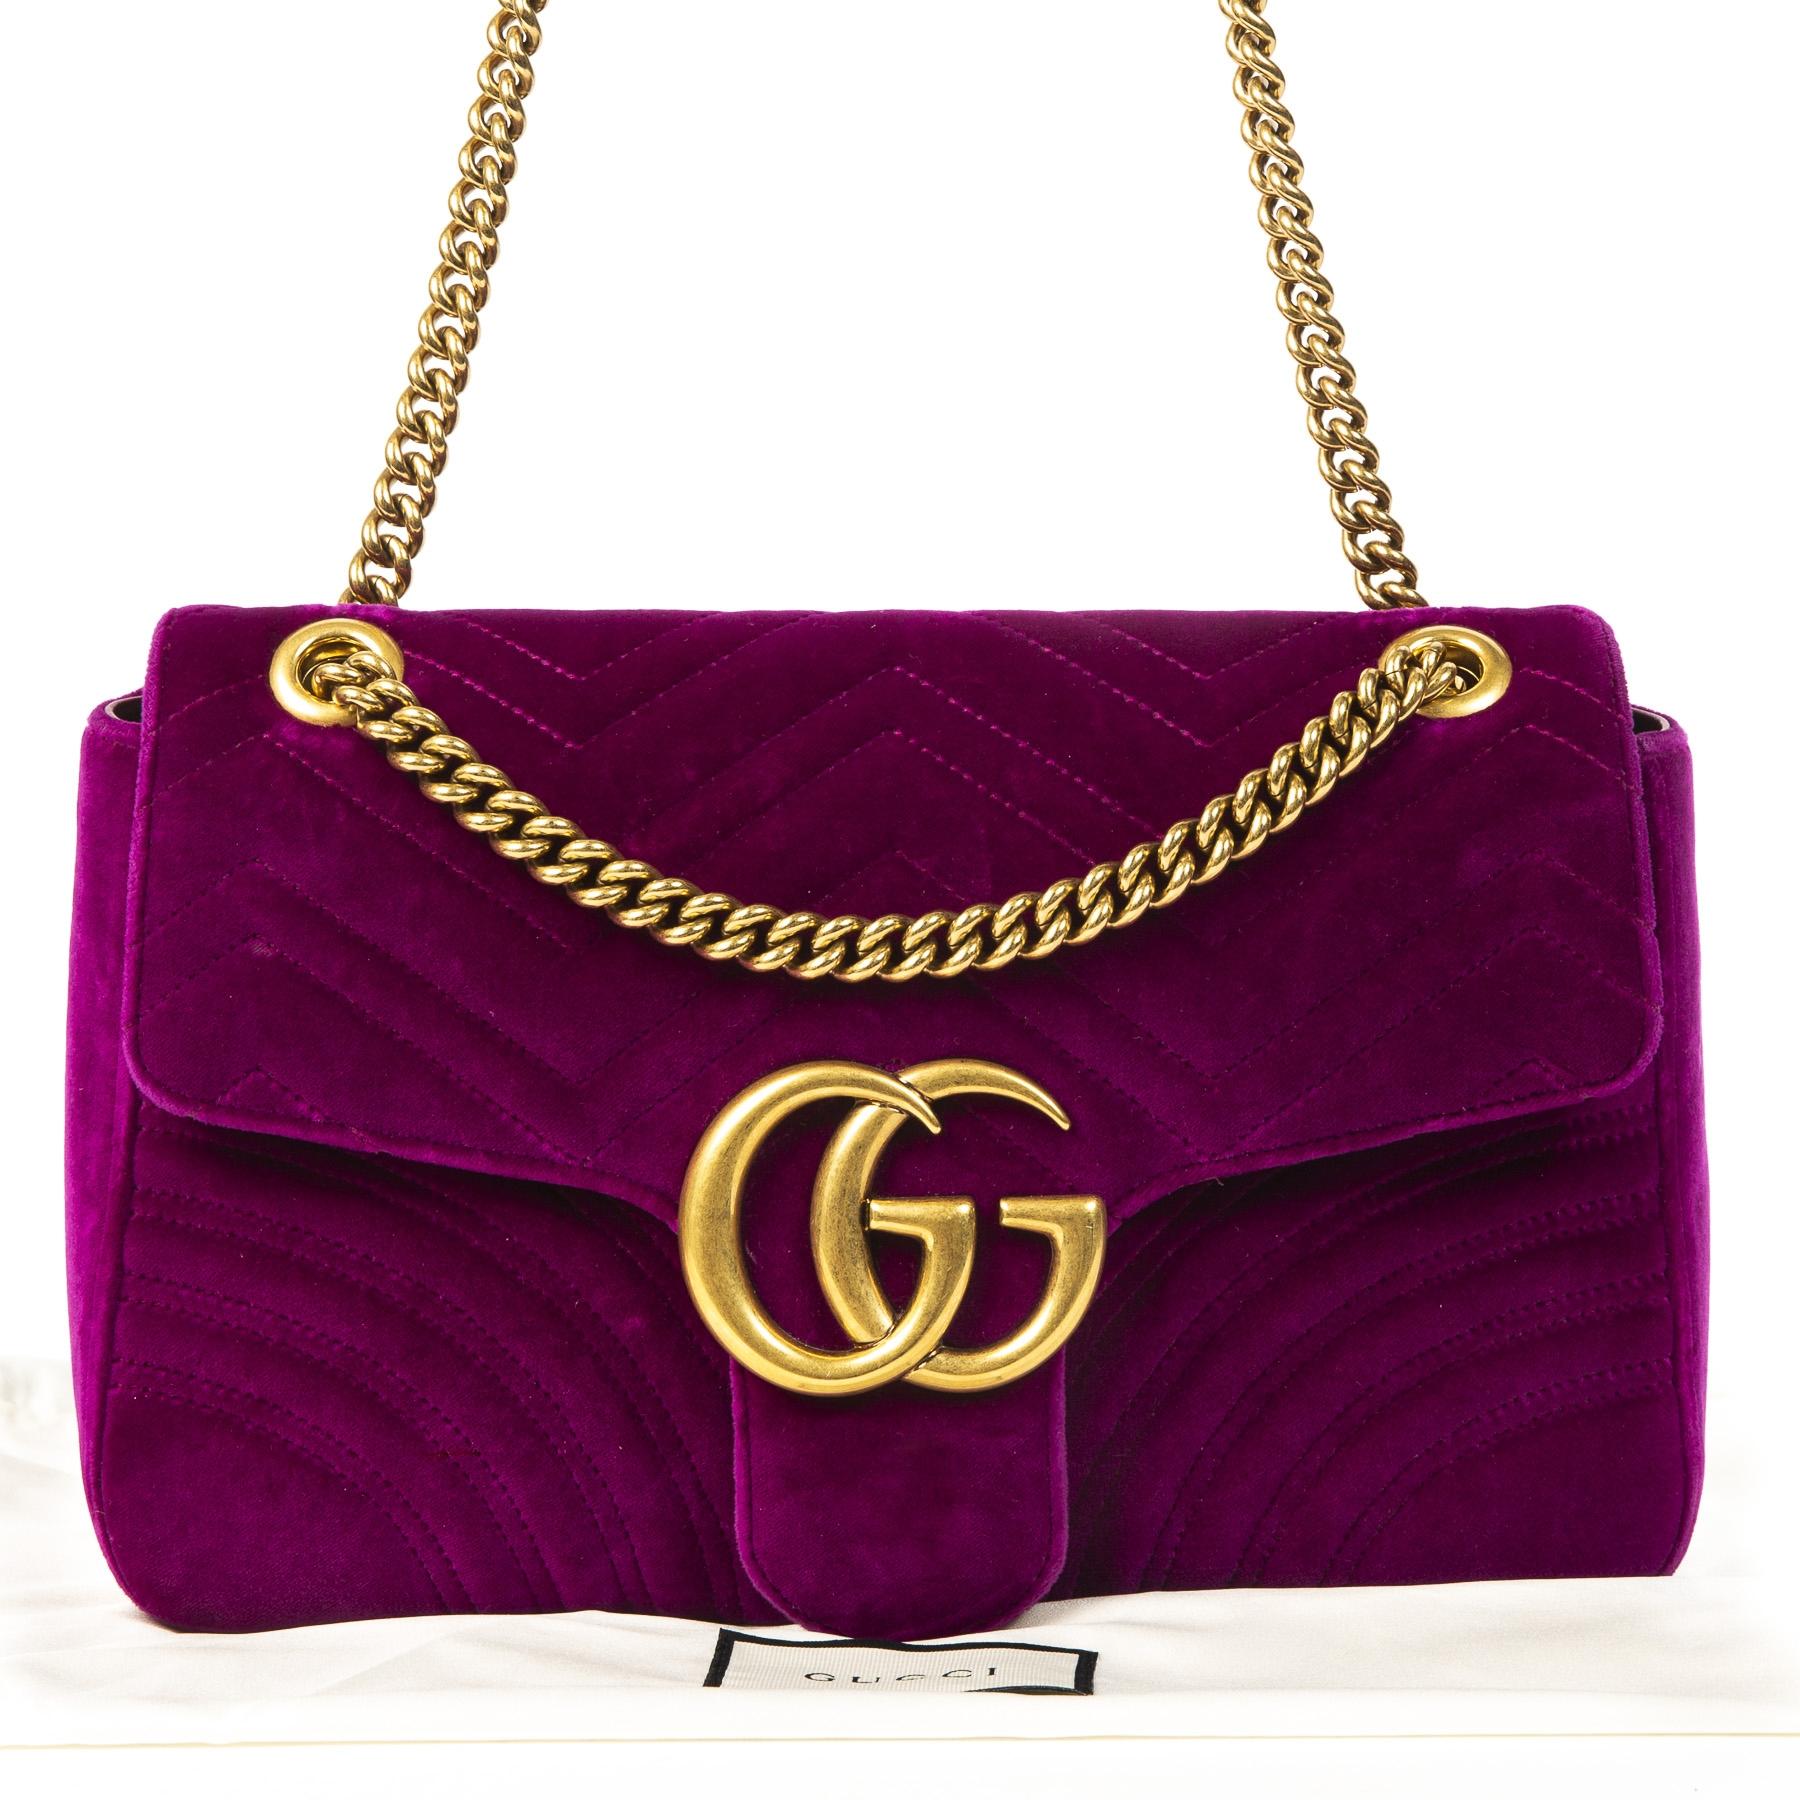 Gucci GG Marmont Medium Fuchsia Velvet Shoulder Bag best price online